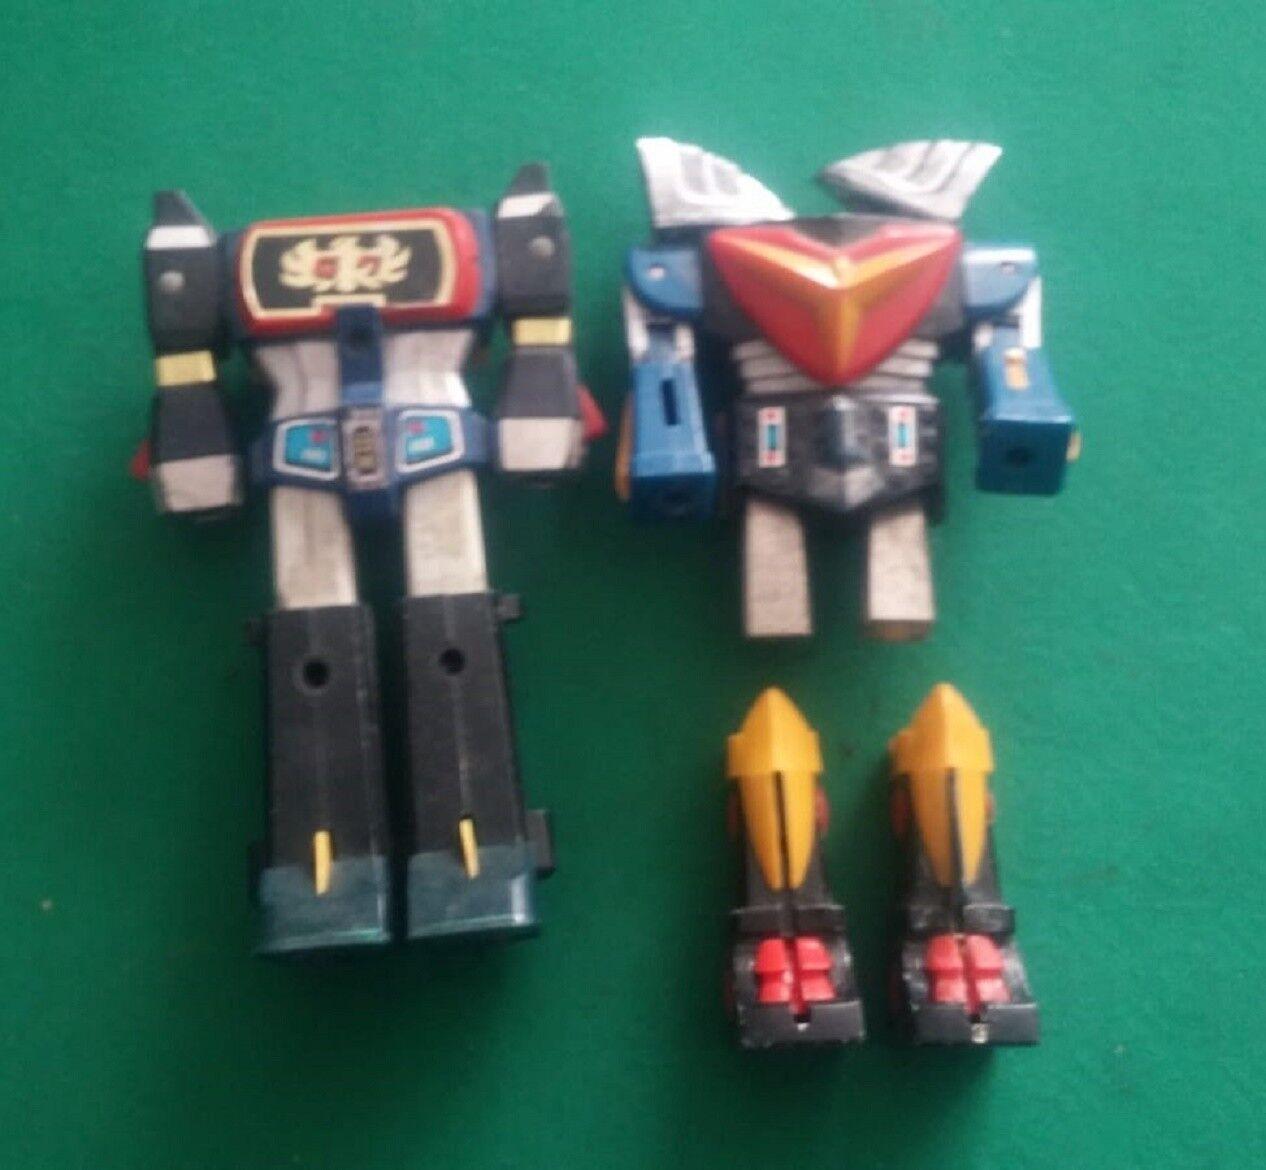 LOTTO DAITARN 3 TRIDER G7 - 2 ROBOTS - ROBOT - VINTAGE TOYS